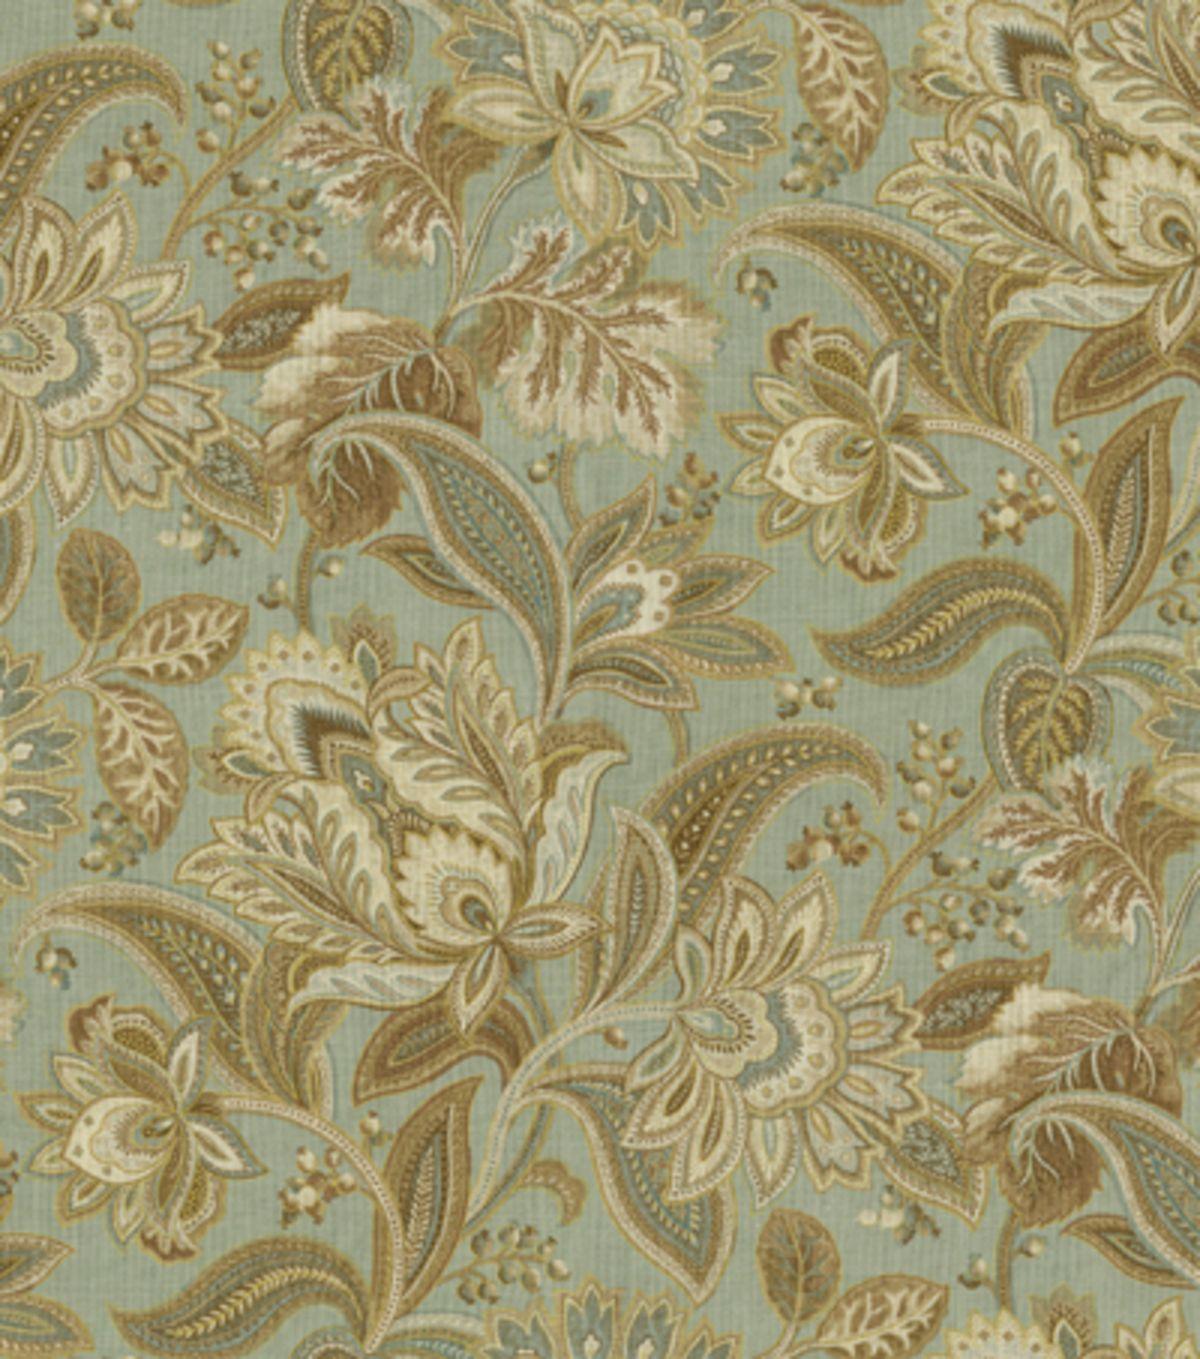 Home Decor Print Fabric Croscill Valdosta Mist At Joann